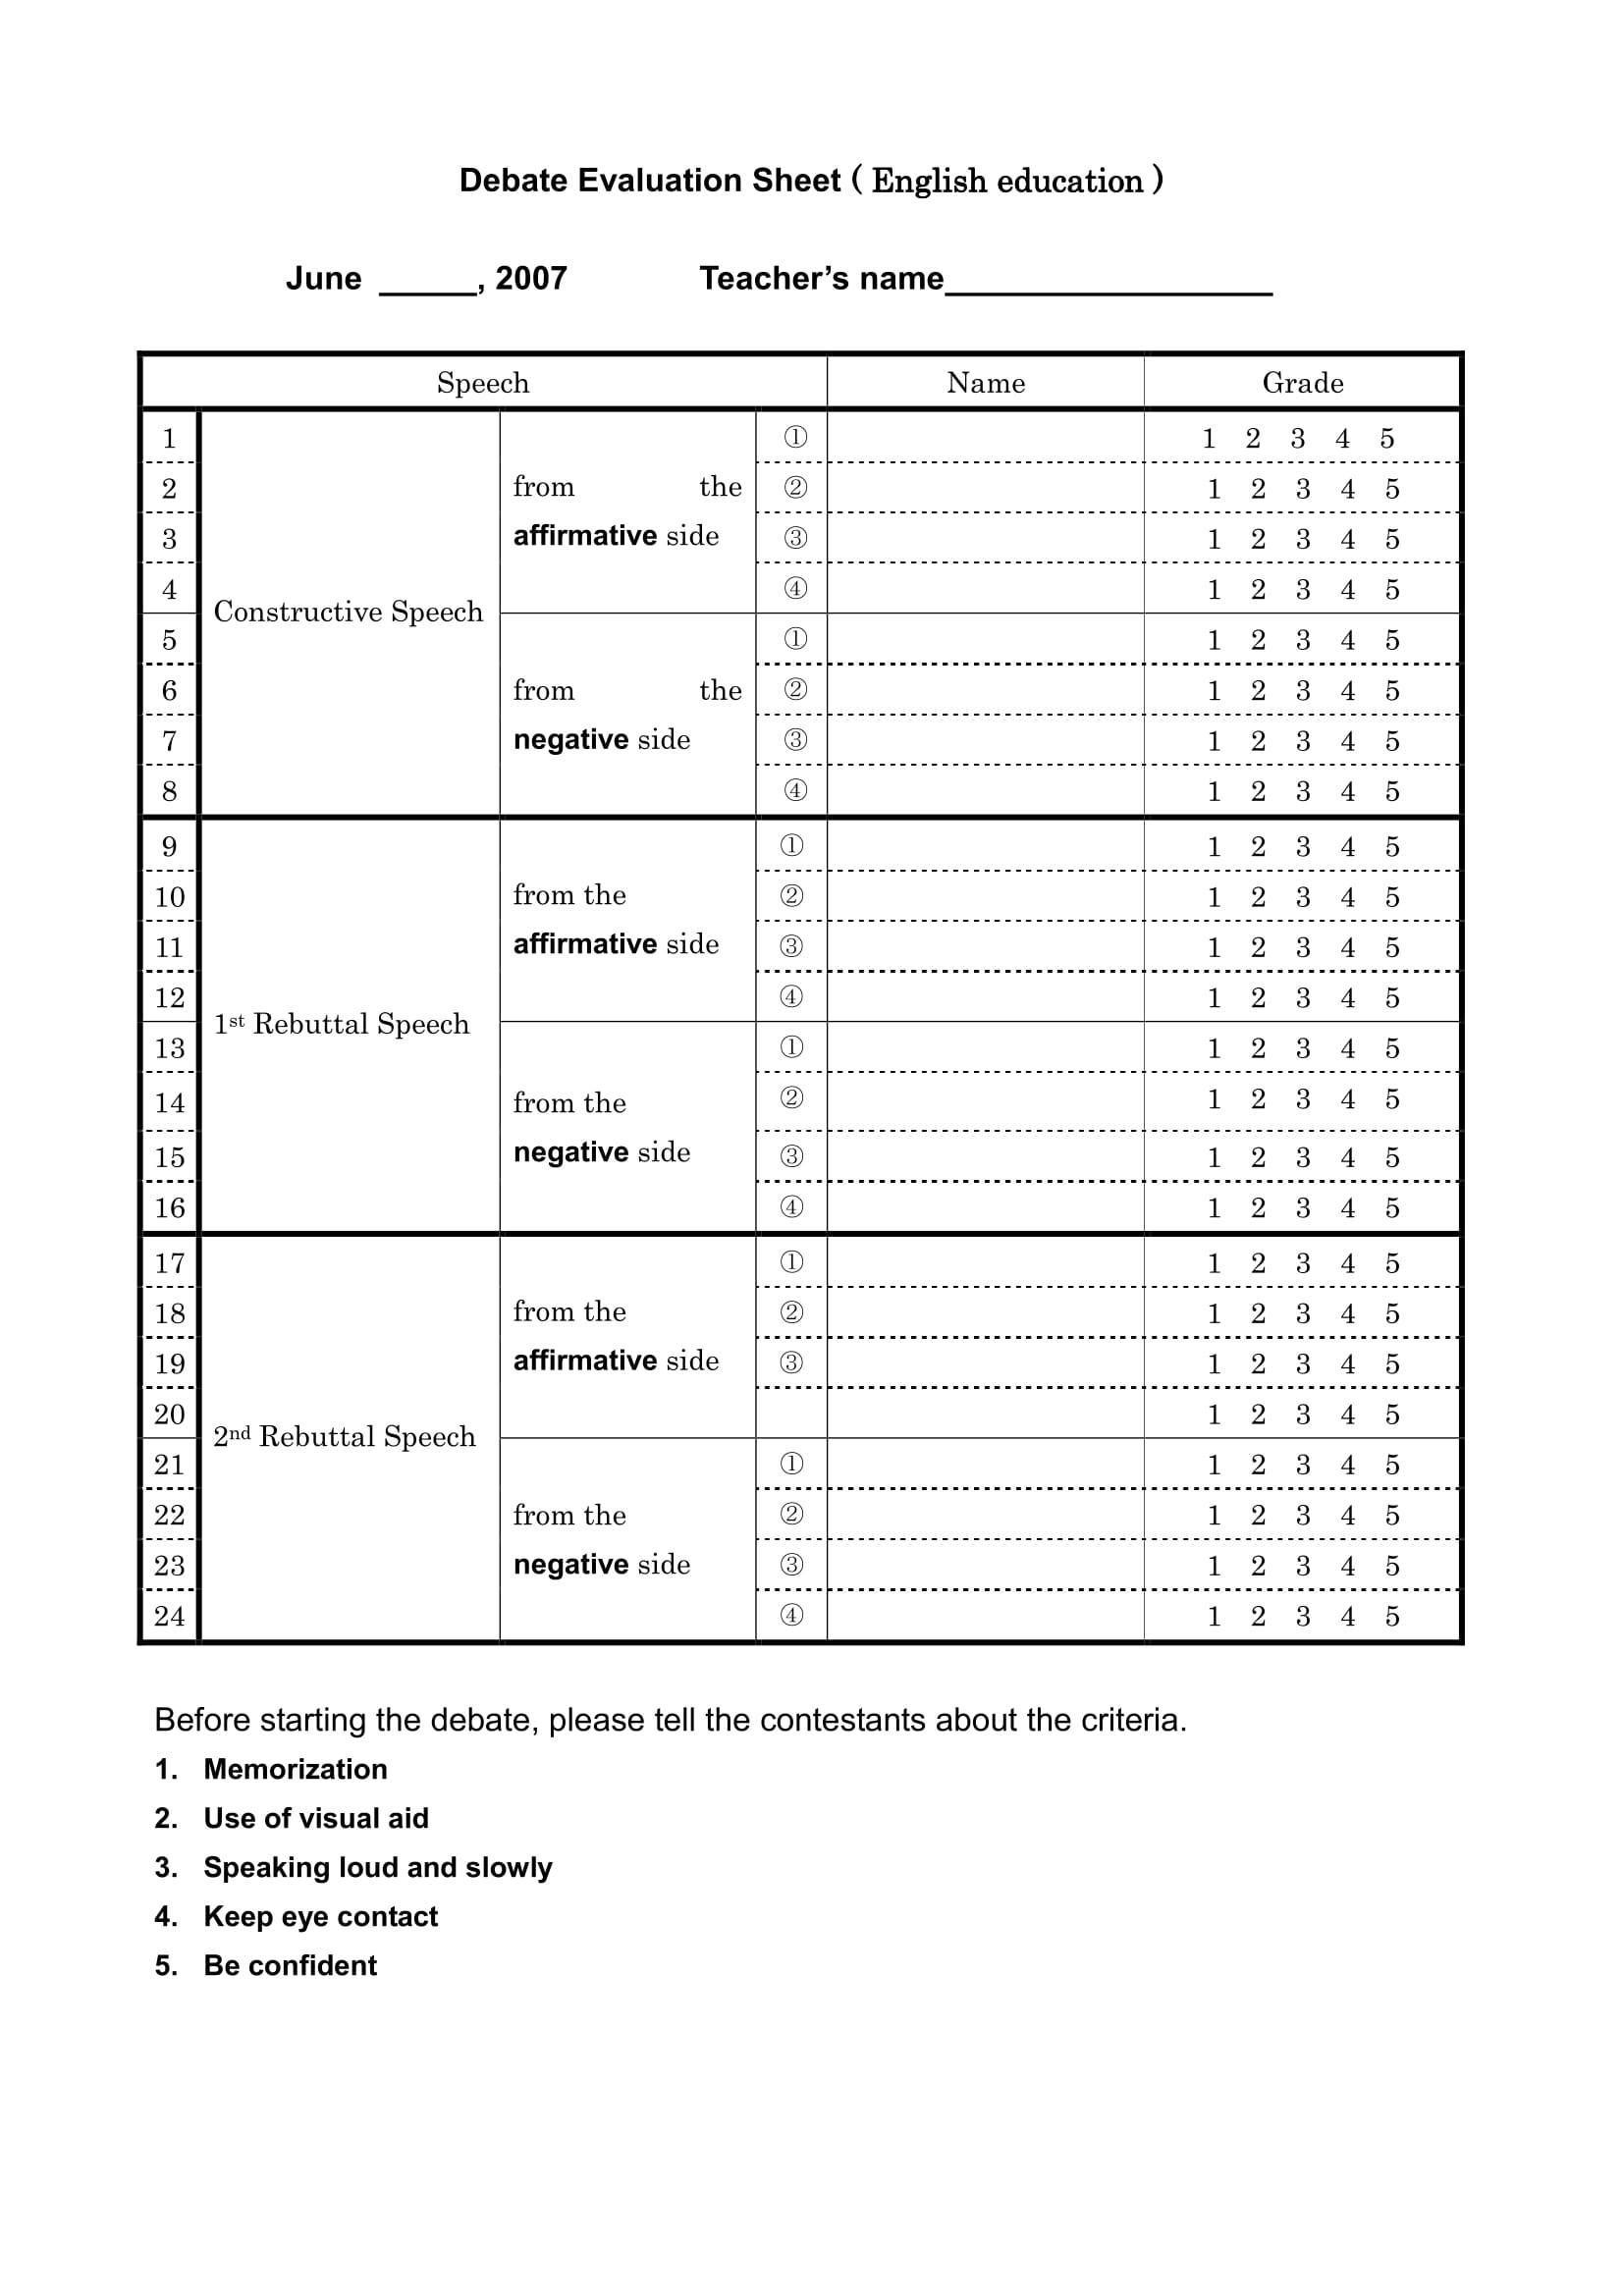 english education debate evaluation form 1